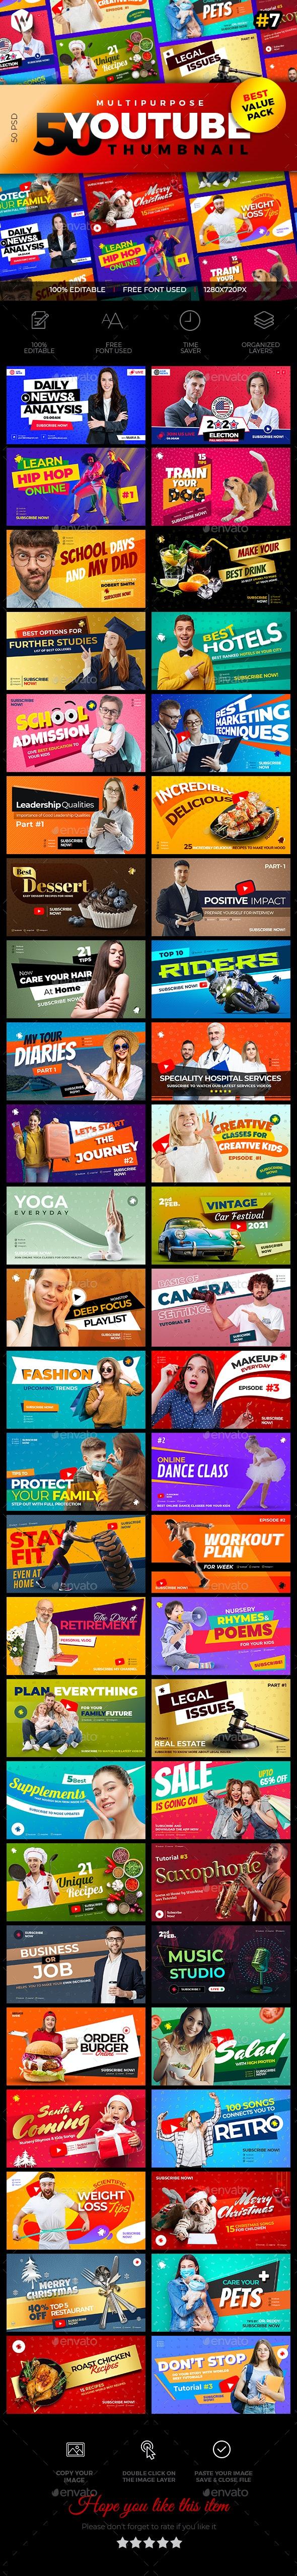 50 Youtube Thumbnail-V7 - Social Media Web Elements